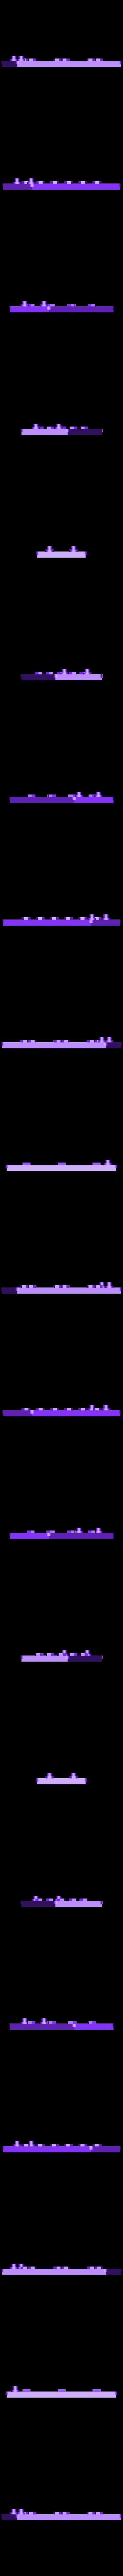 Batterie PL_dessus.STL Download STL file Battery for rc trucks • 3D print object, ConceptRCTruck